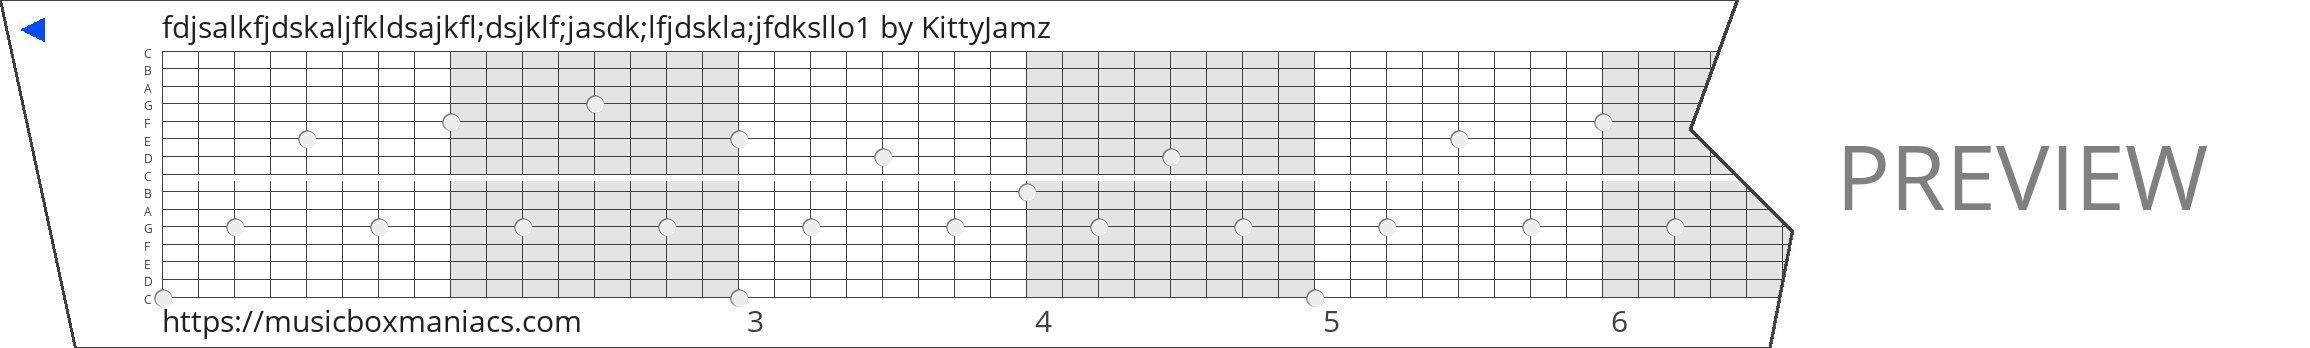 fdjsalkfjdskaljfkldsajkfl;dsjklf;jasdk;lfjdskla;jfdksllo1 15 note music box paper strip